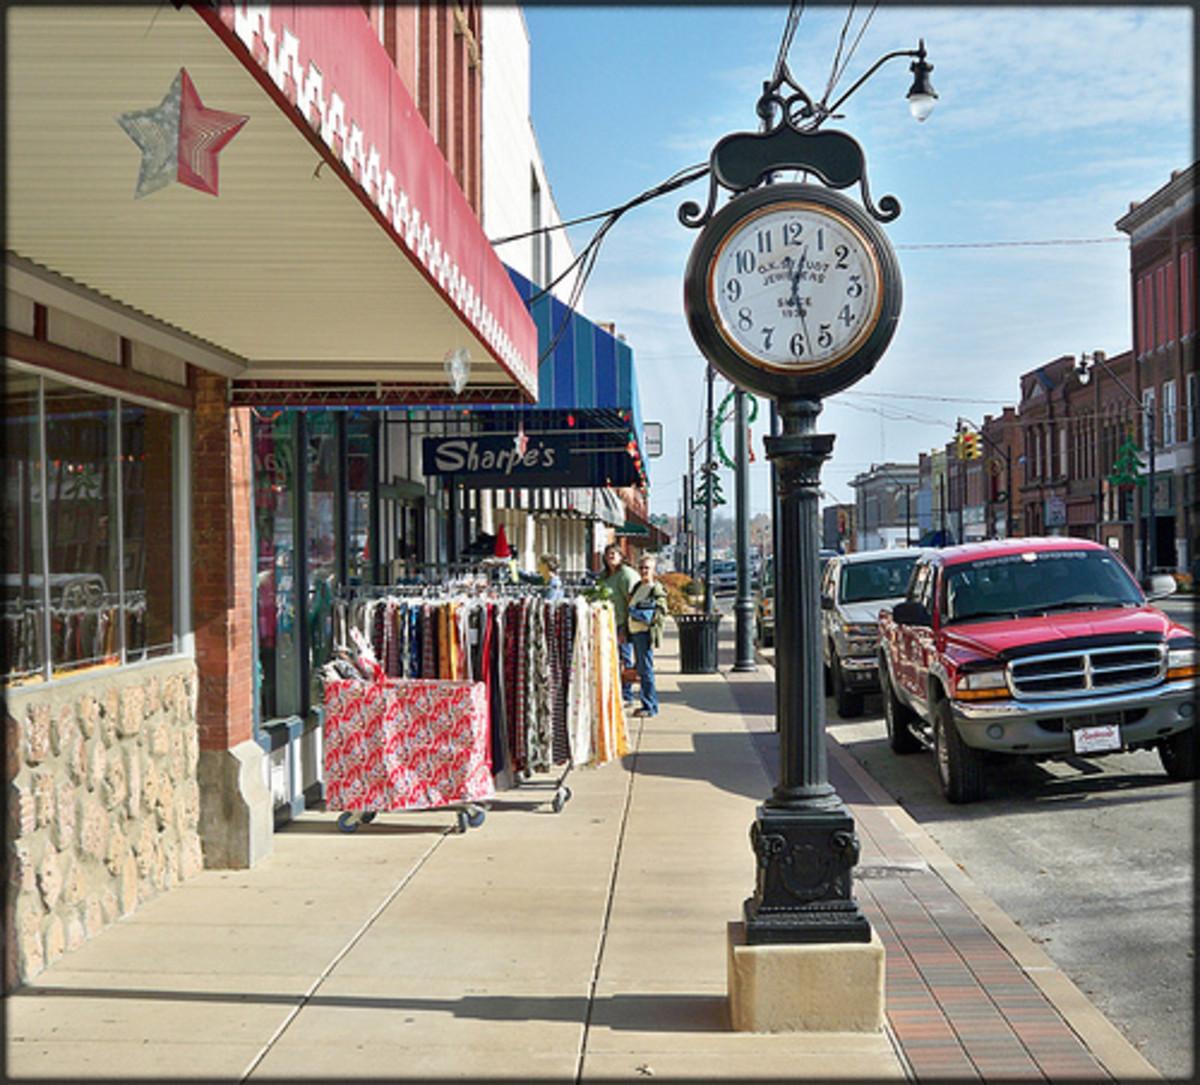 The O.K. Staudt's Jewelers clock in downtown Okmulgee.